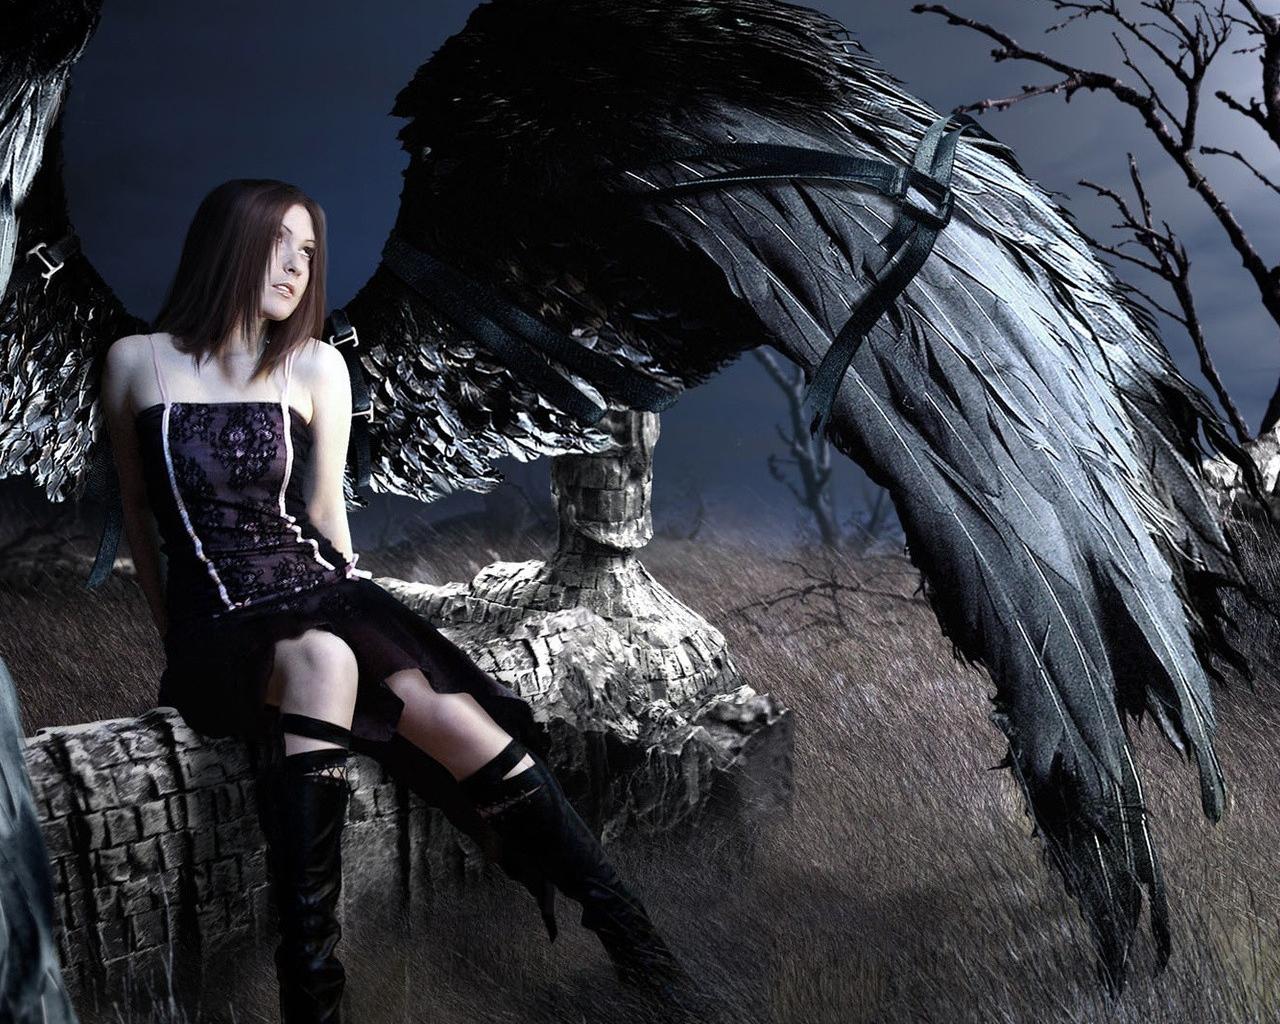 Gothic angel wallpaper wallpapersafari - Gothic angel wallpaper ...